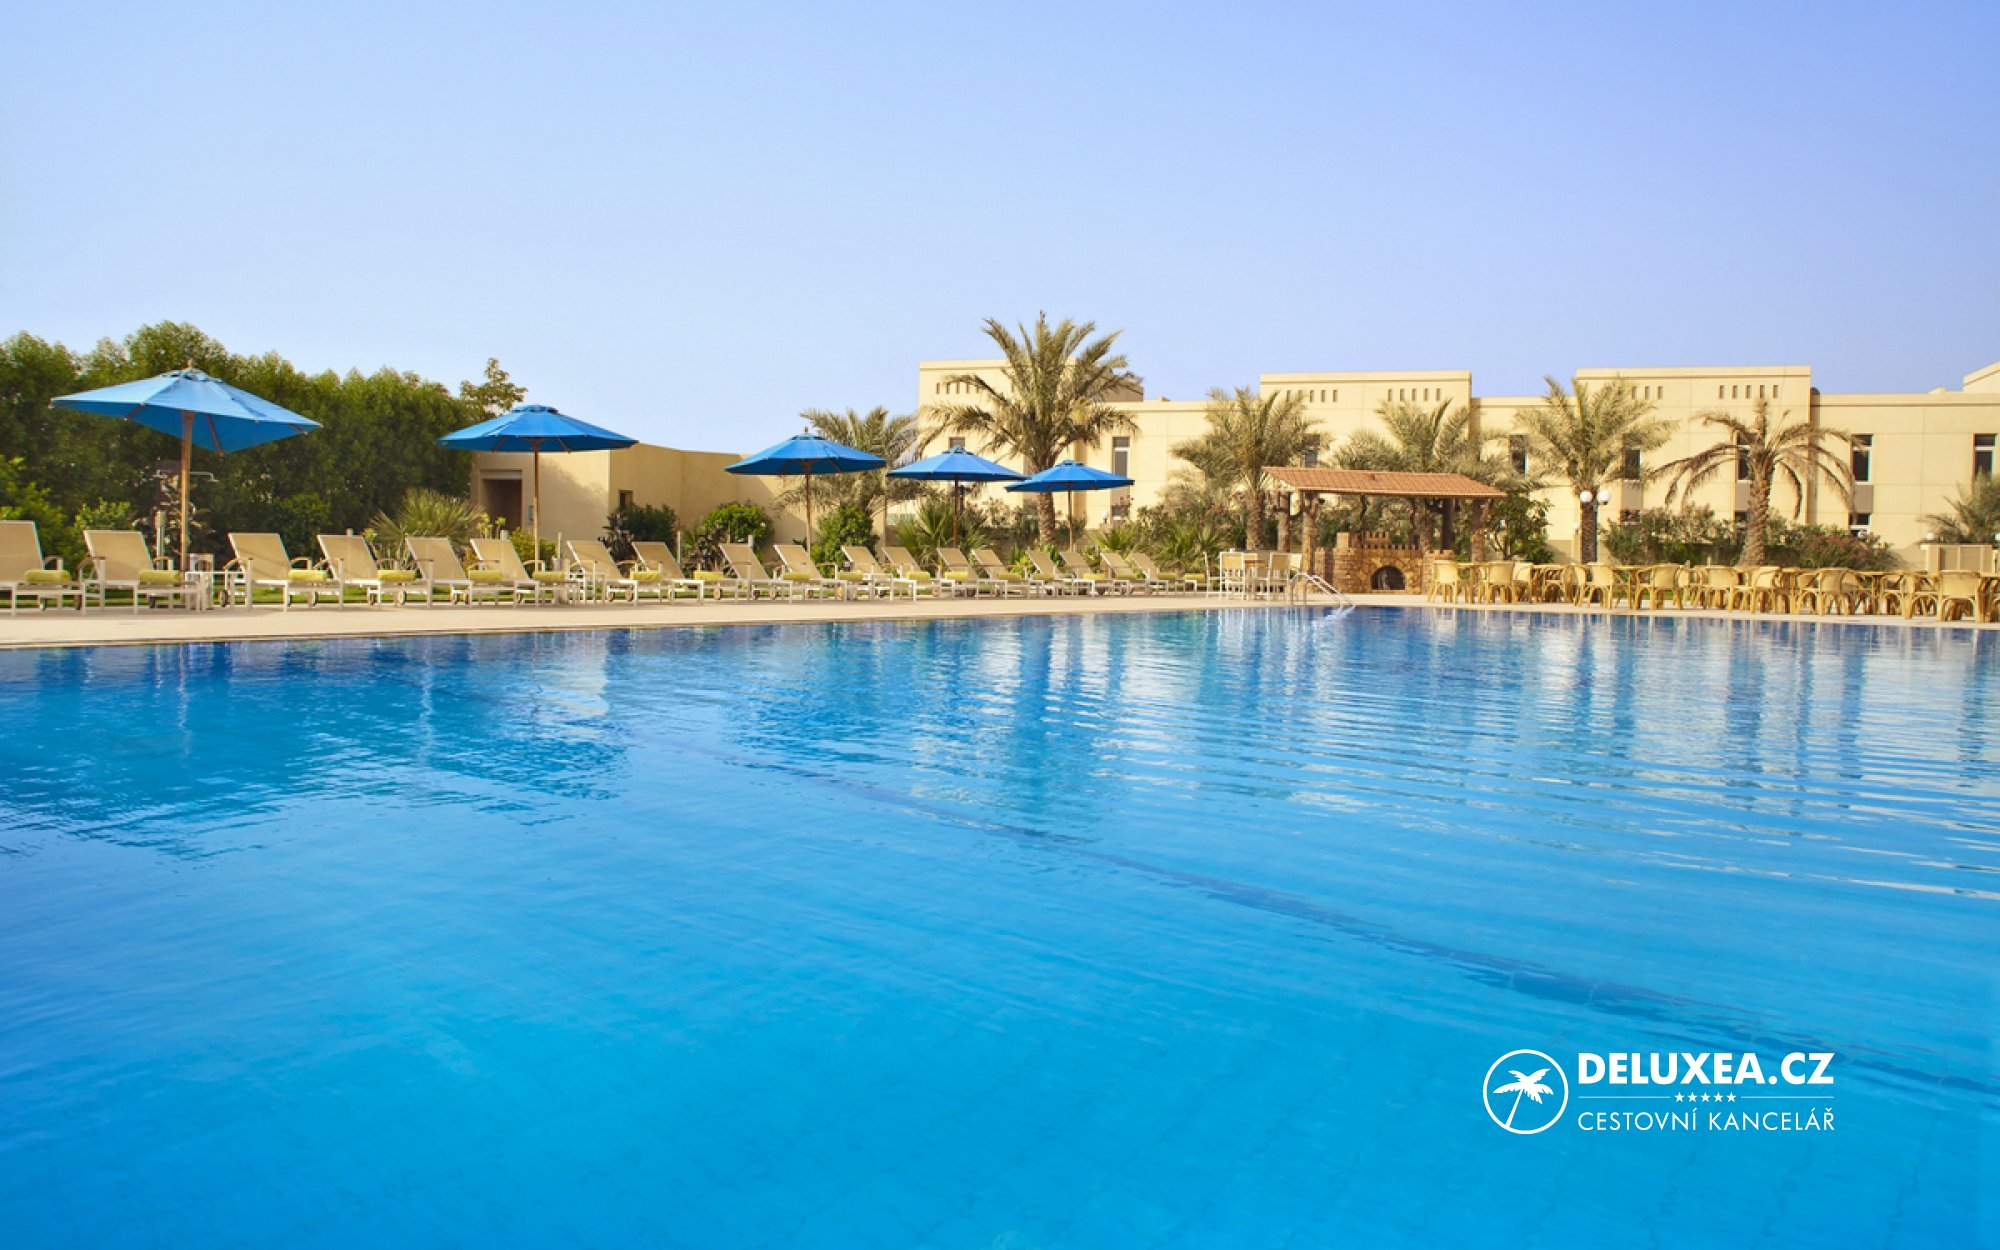 Hotel Acacia Bin Majid Ras Al Khaimah Ras Al Khaimah Deluxea